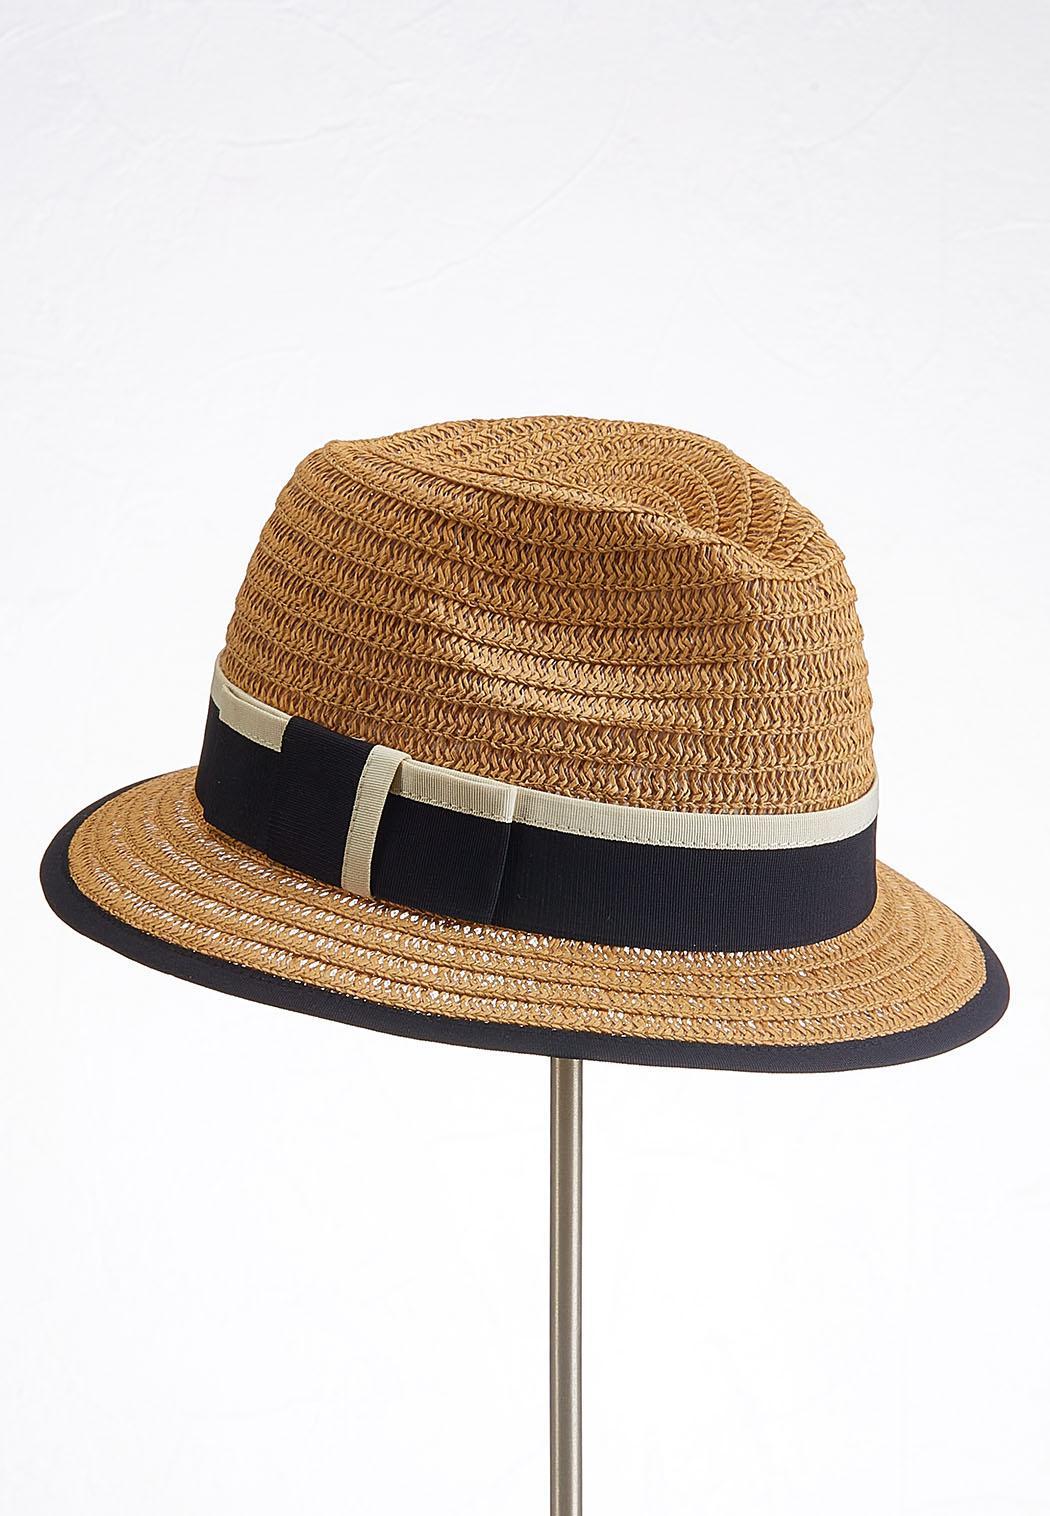 Colorblock Band Straw Fedora Hat